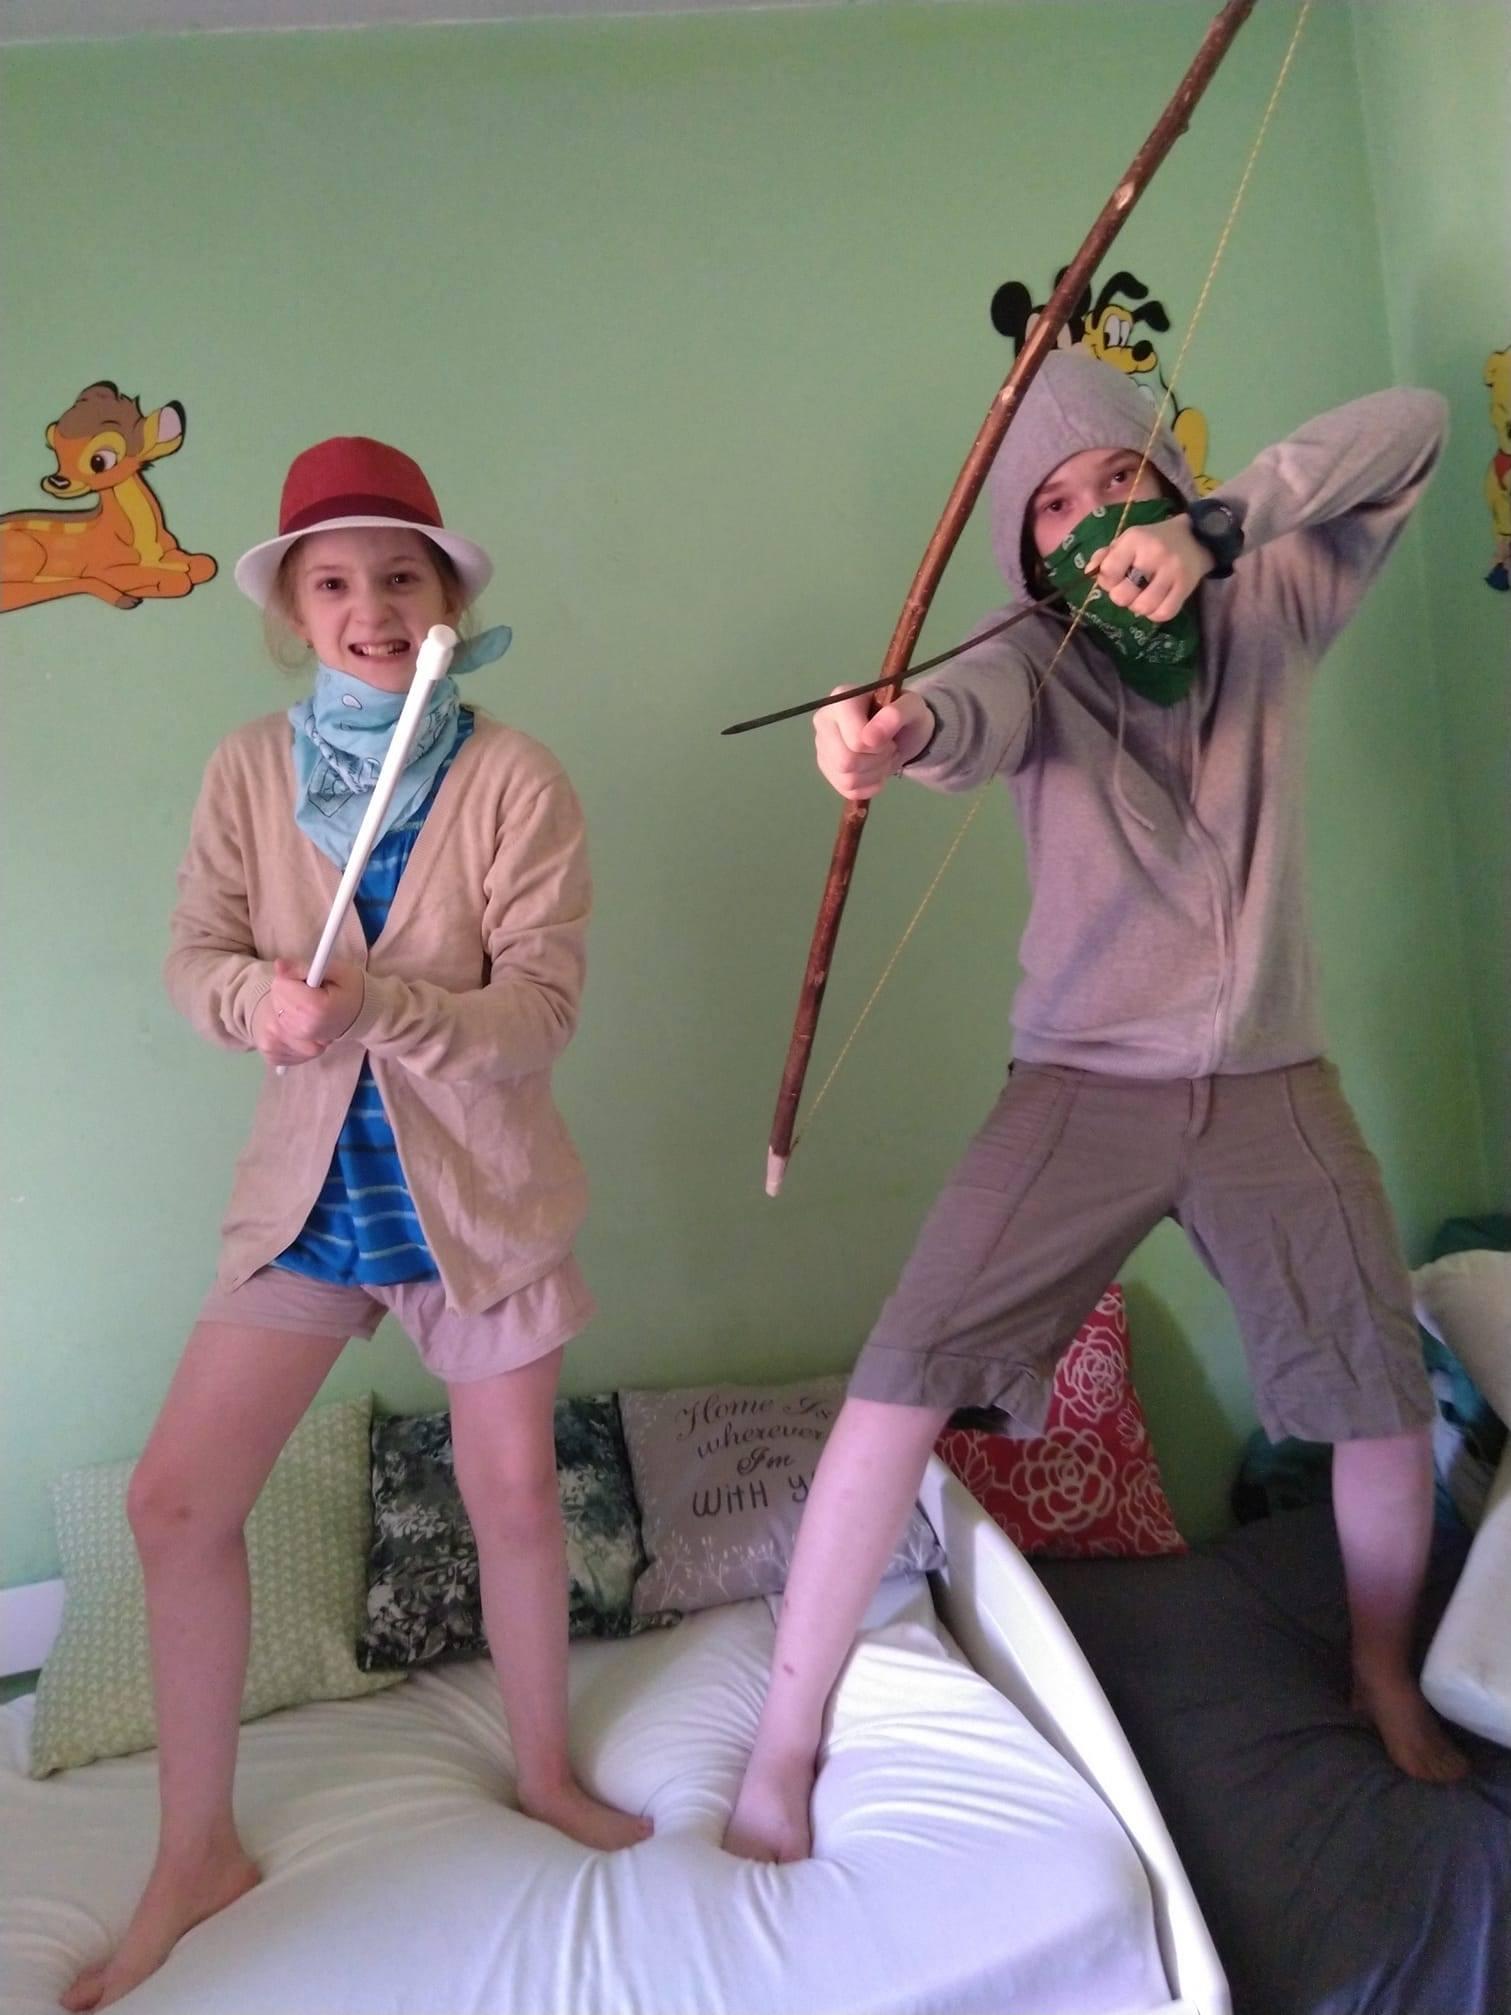 Yuppi Camp Online: terapie prin experiență pentru copii și tineri cronic bolnavi